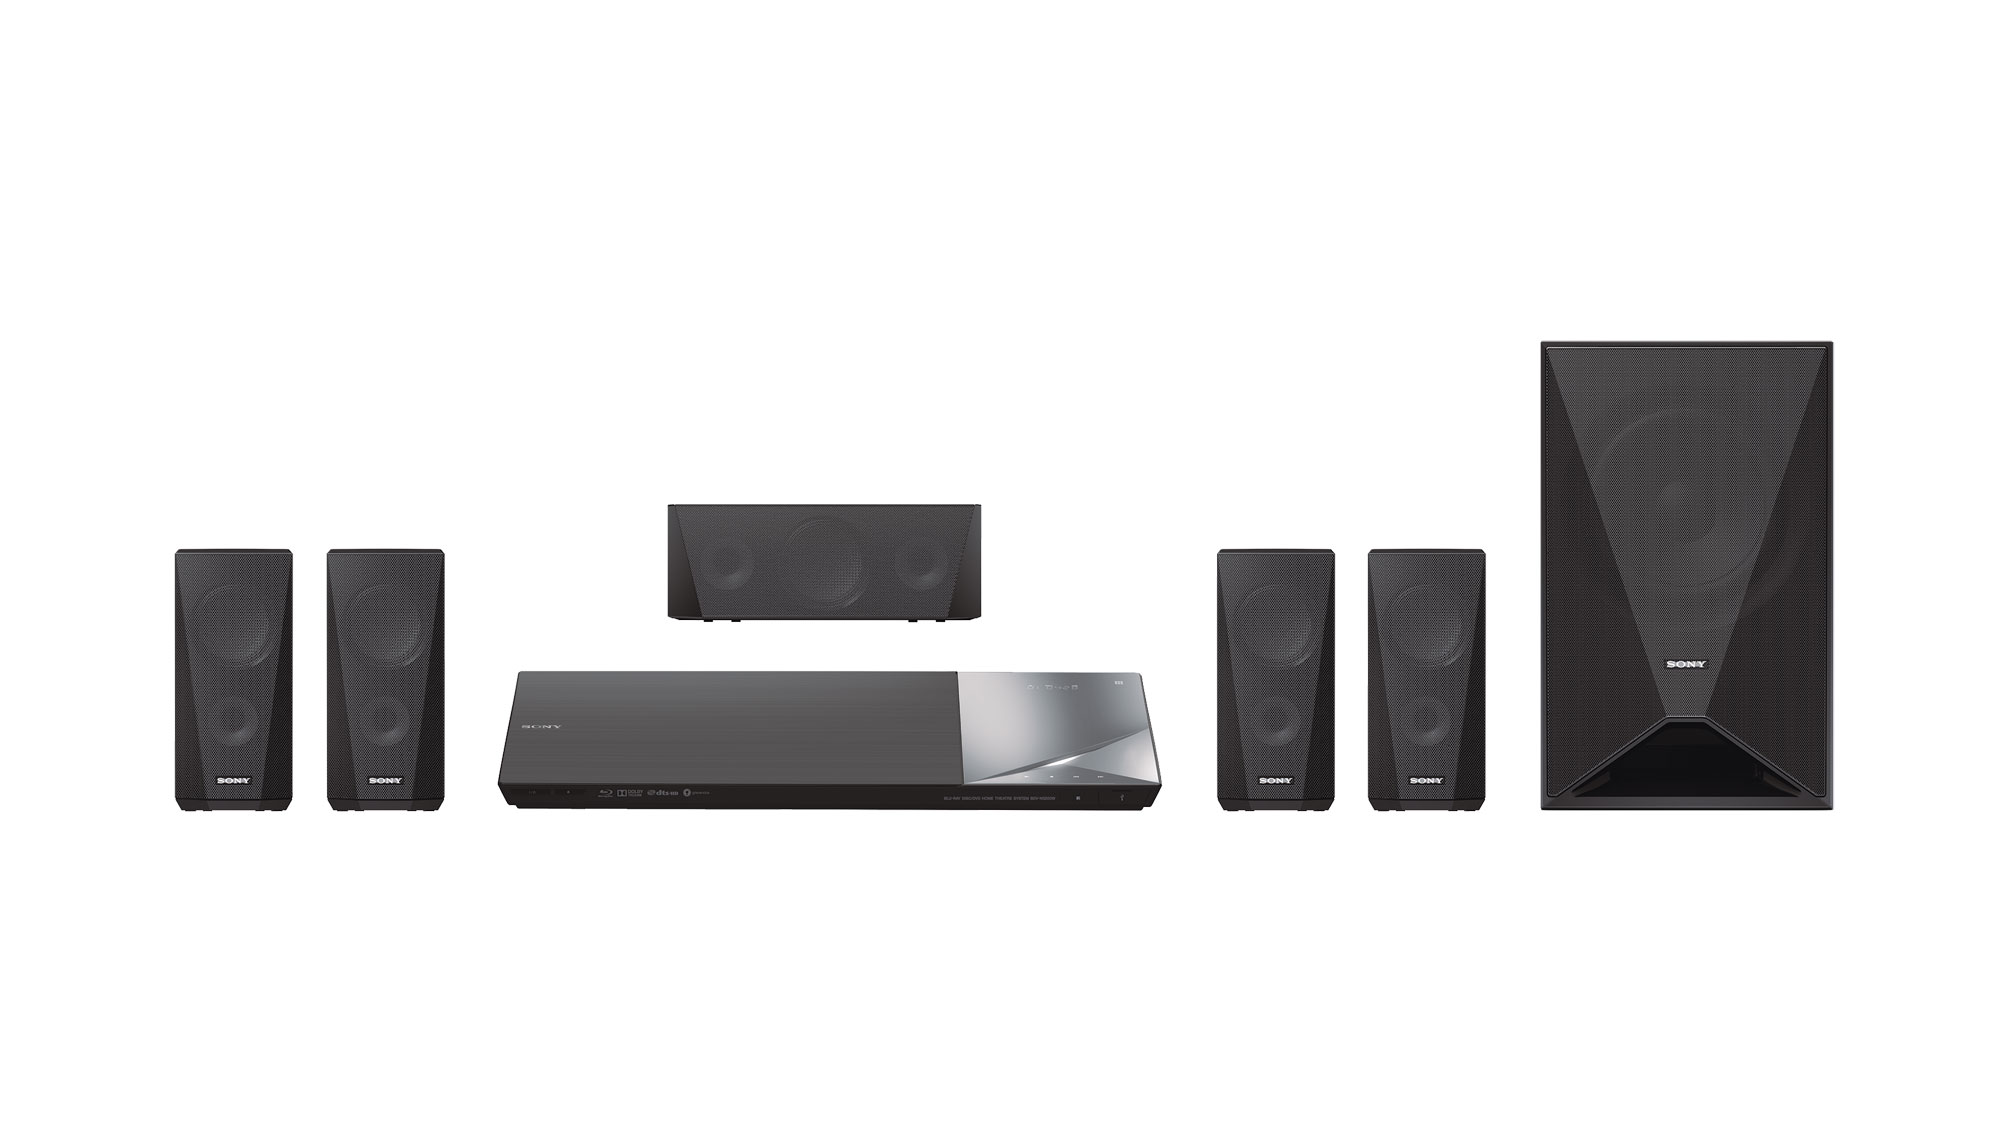 Sony BDV-N5200W 1000W 3D Blu-Ray Home Cinema